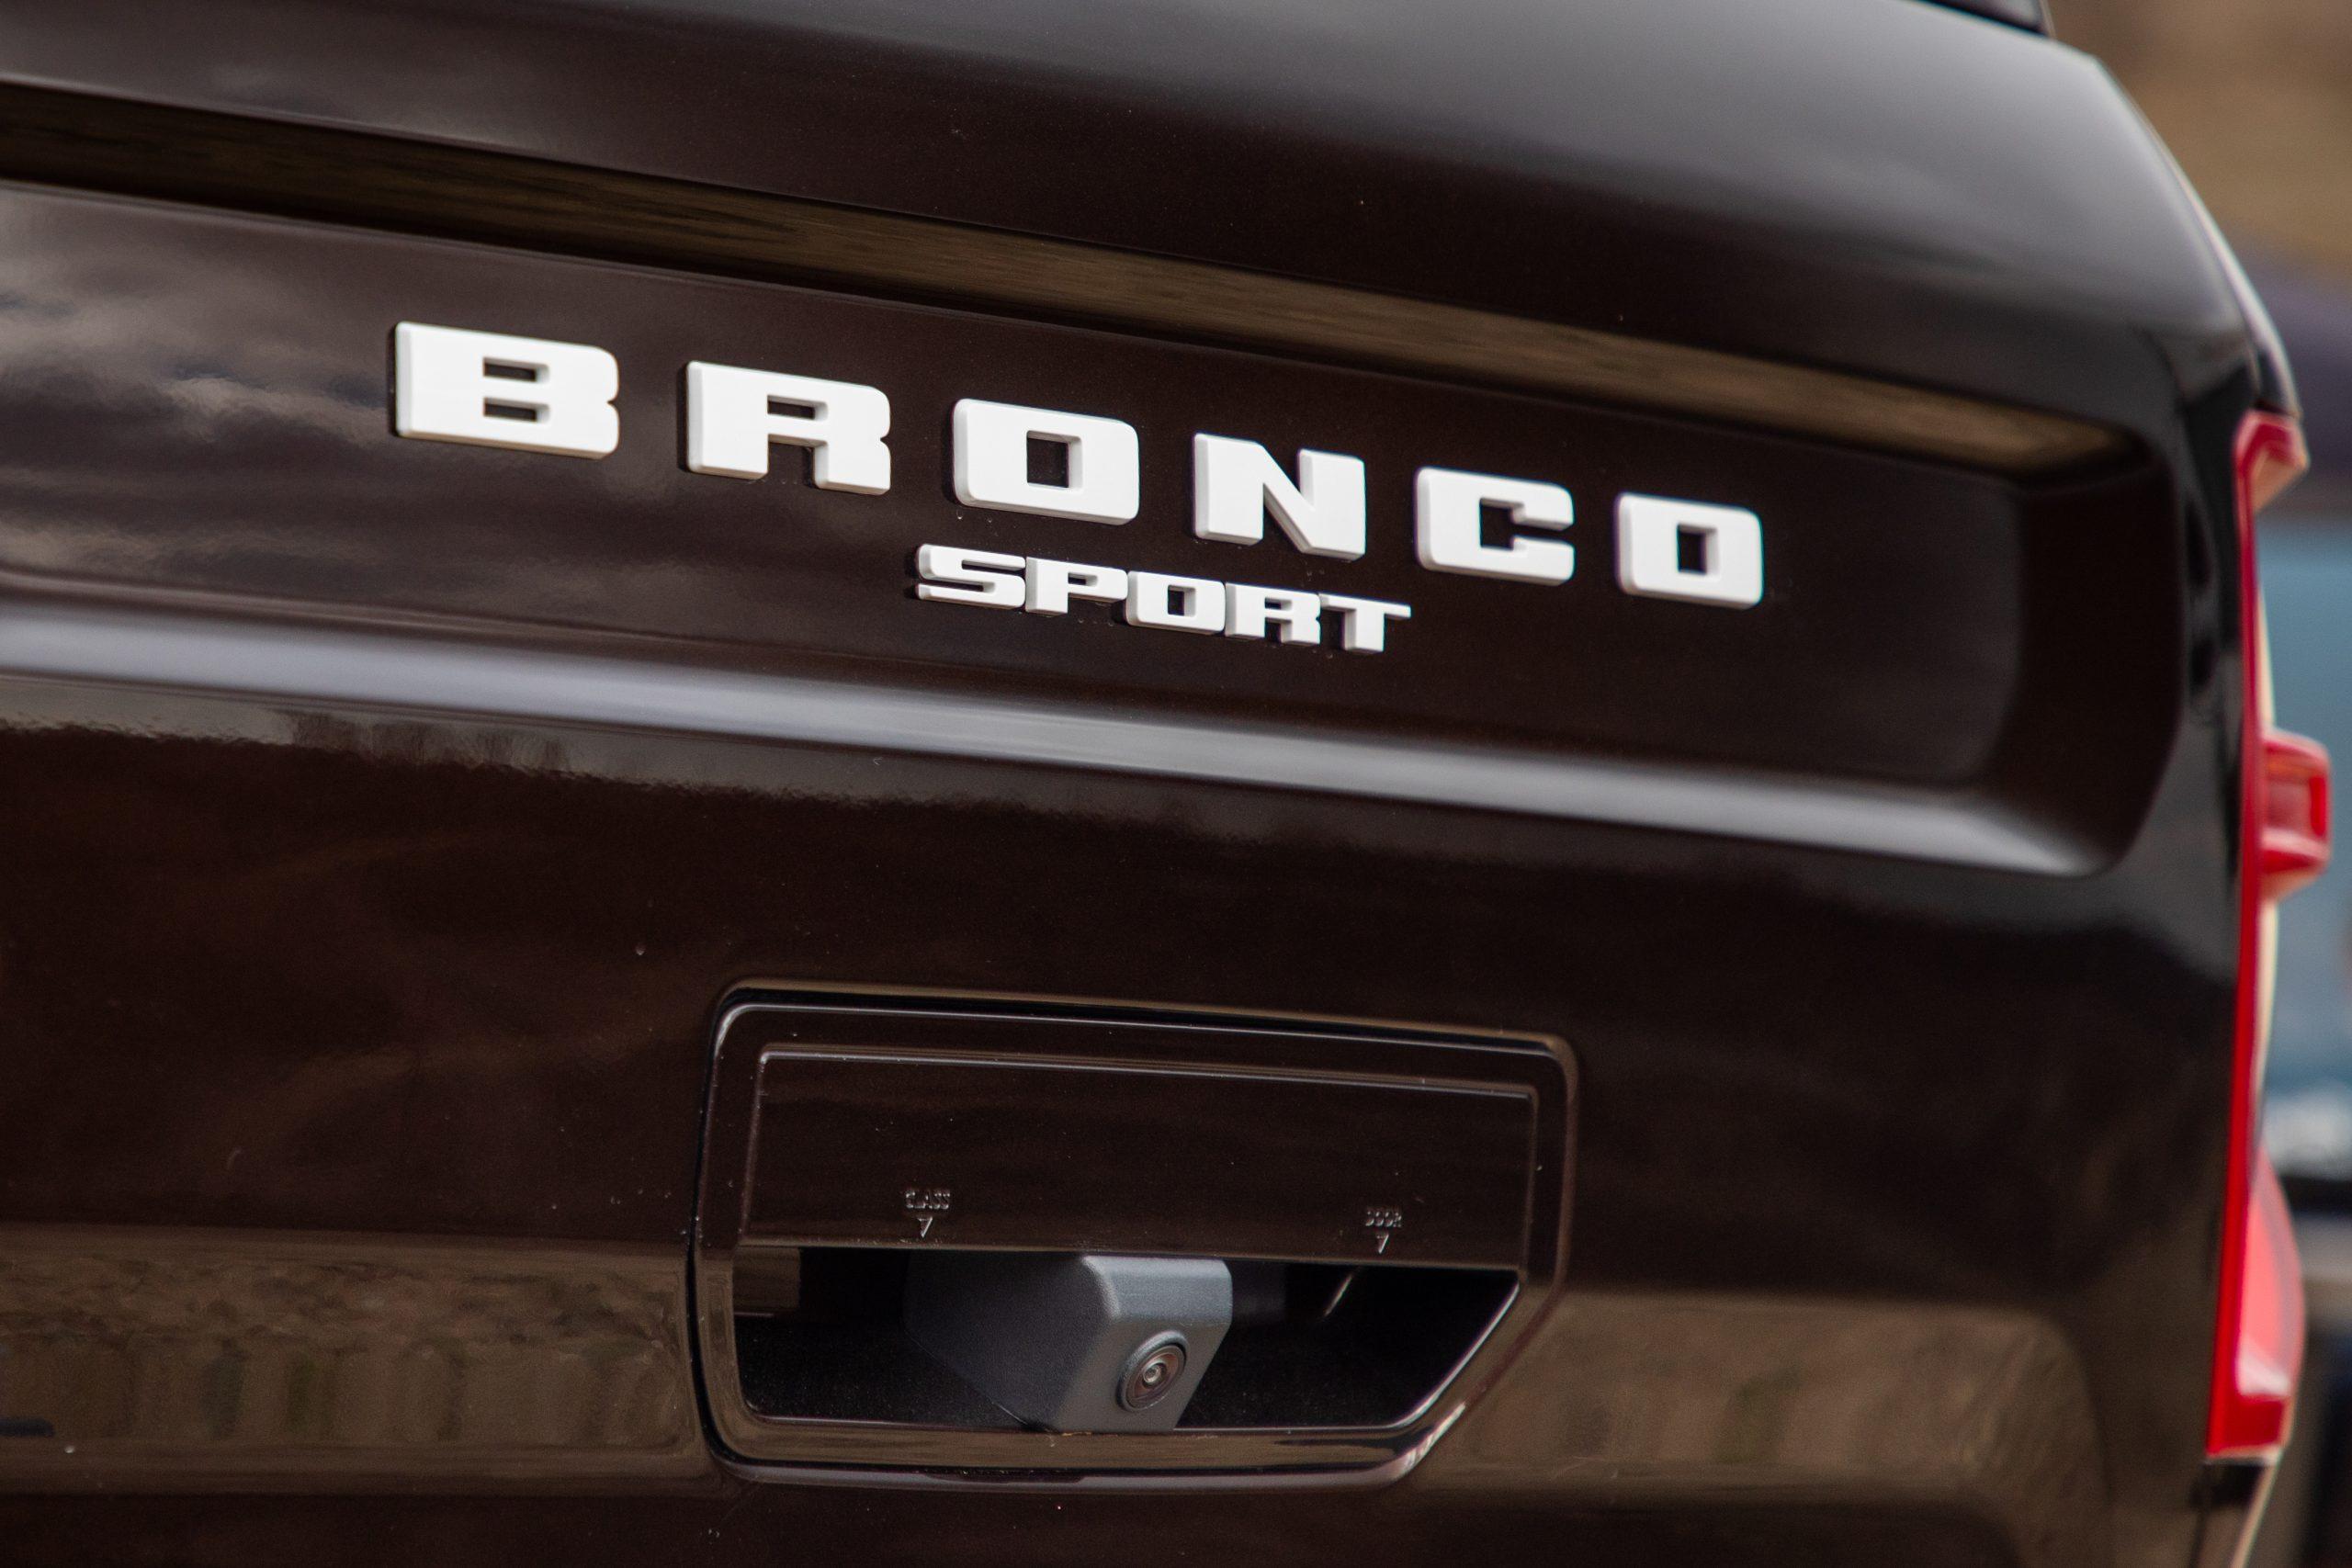 2021 Bronco Sport rear trunk badging